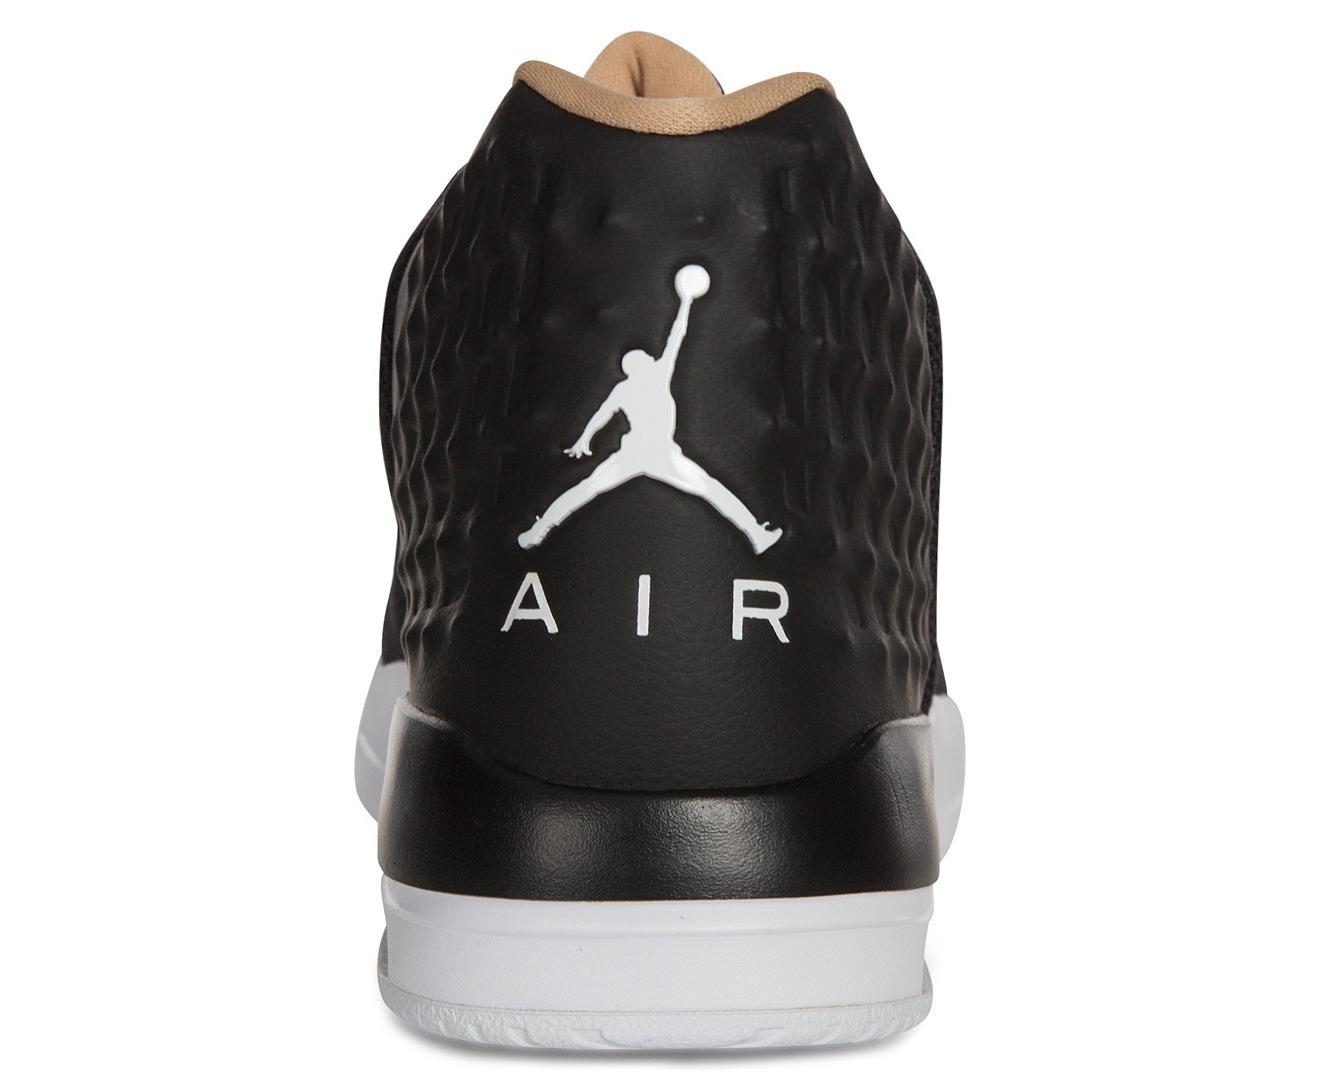 ae6e38cdf253 Nike Men s Jordan Academy Shoe - Black White Cool Grey Vachetta Tan ...